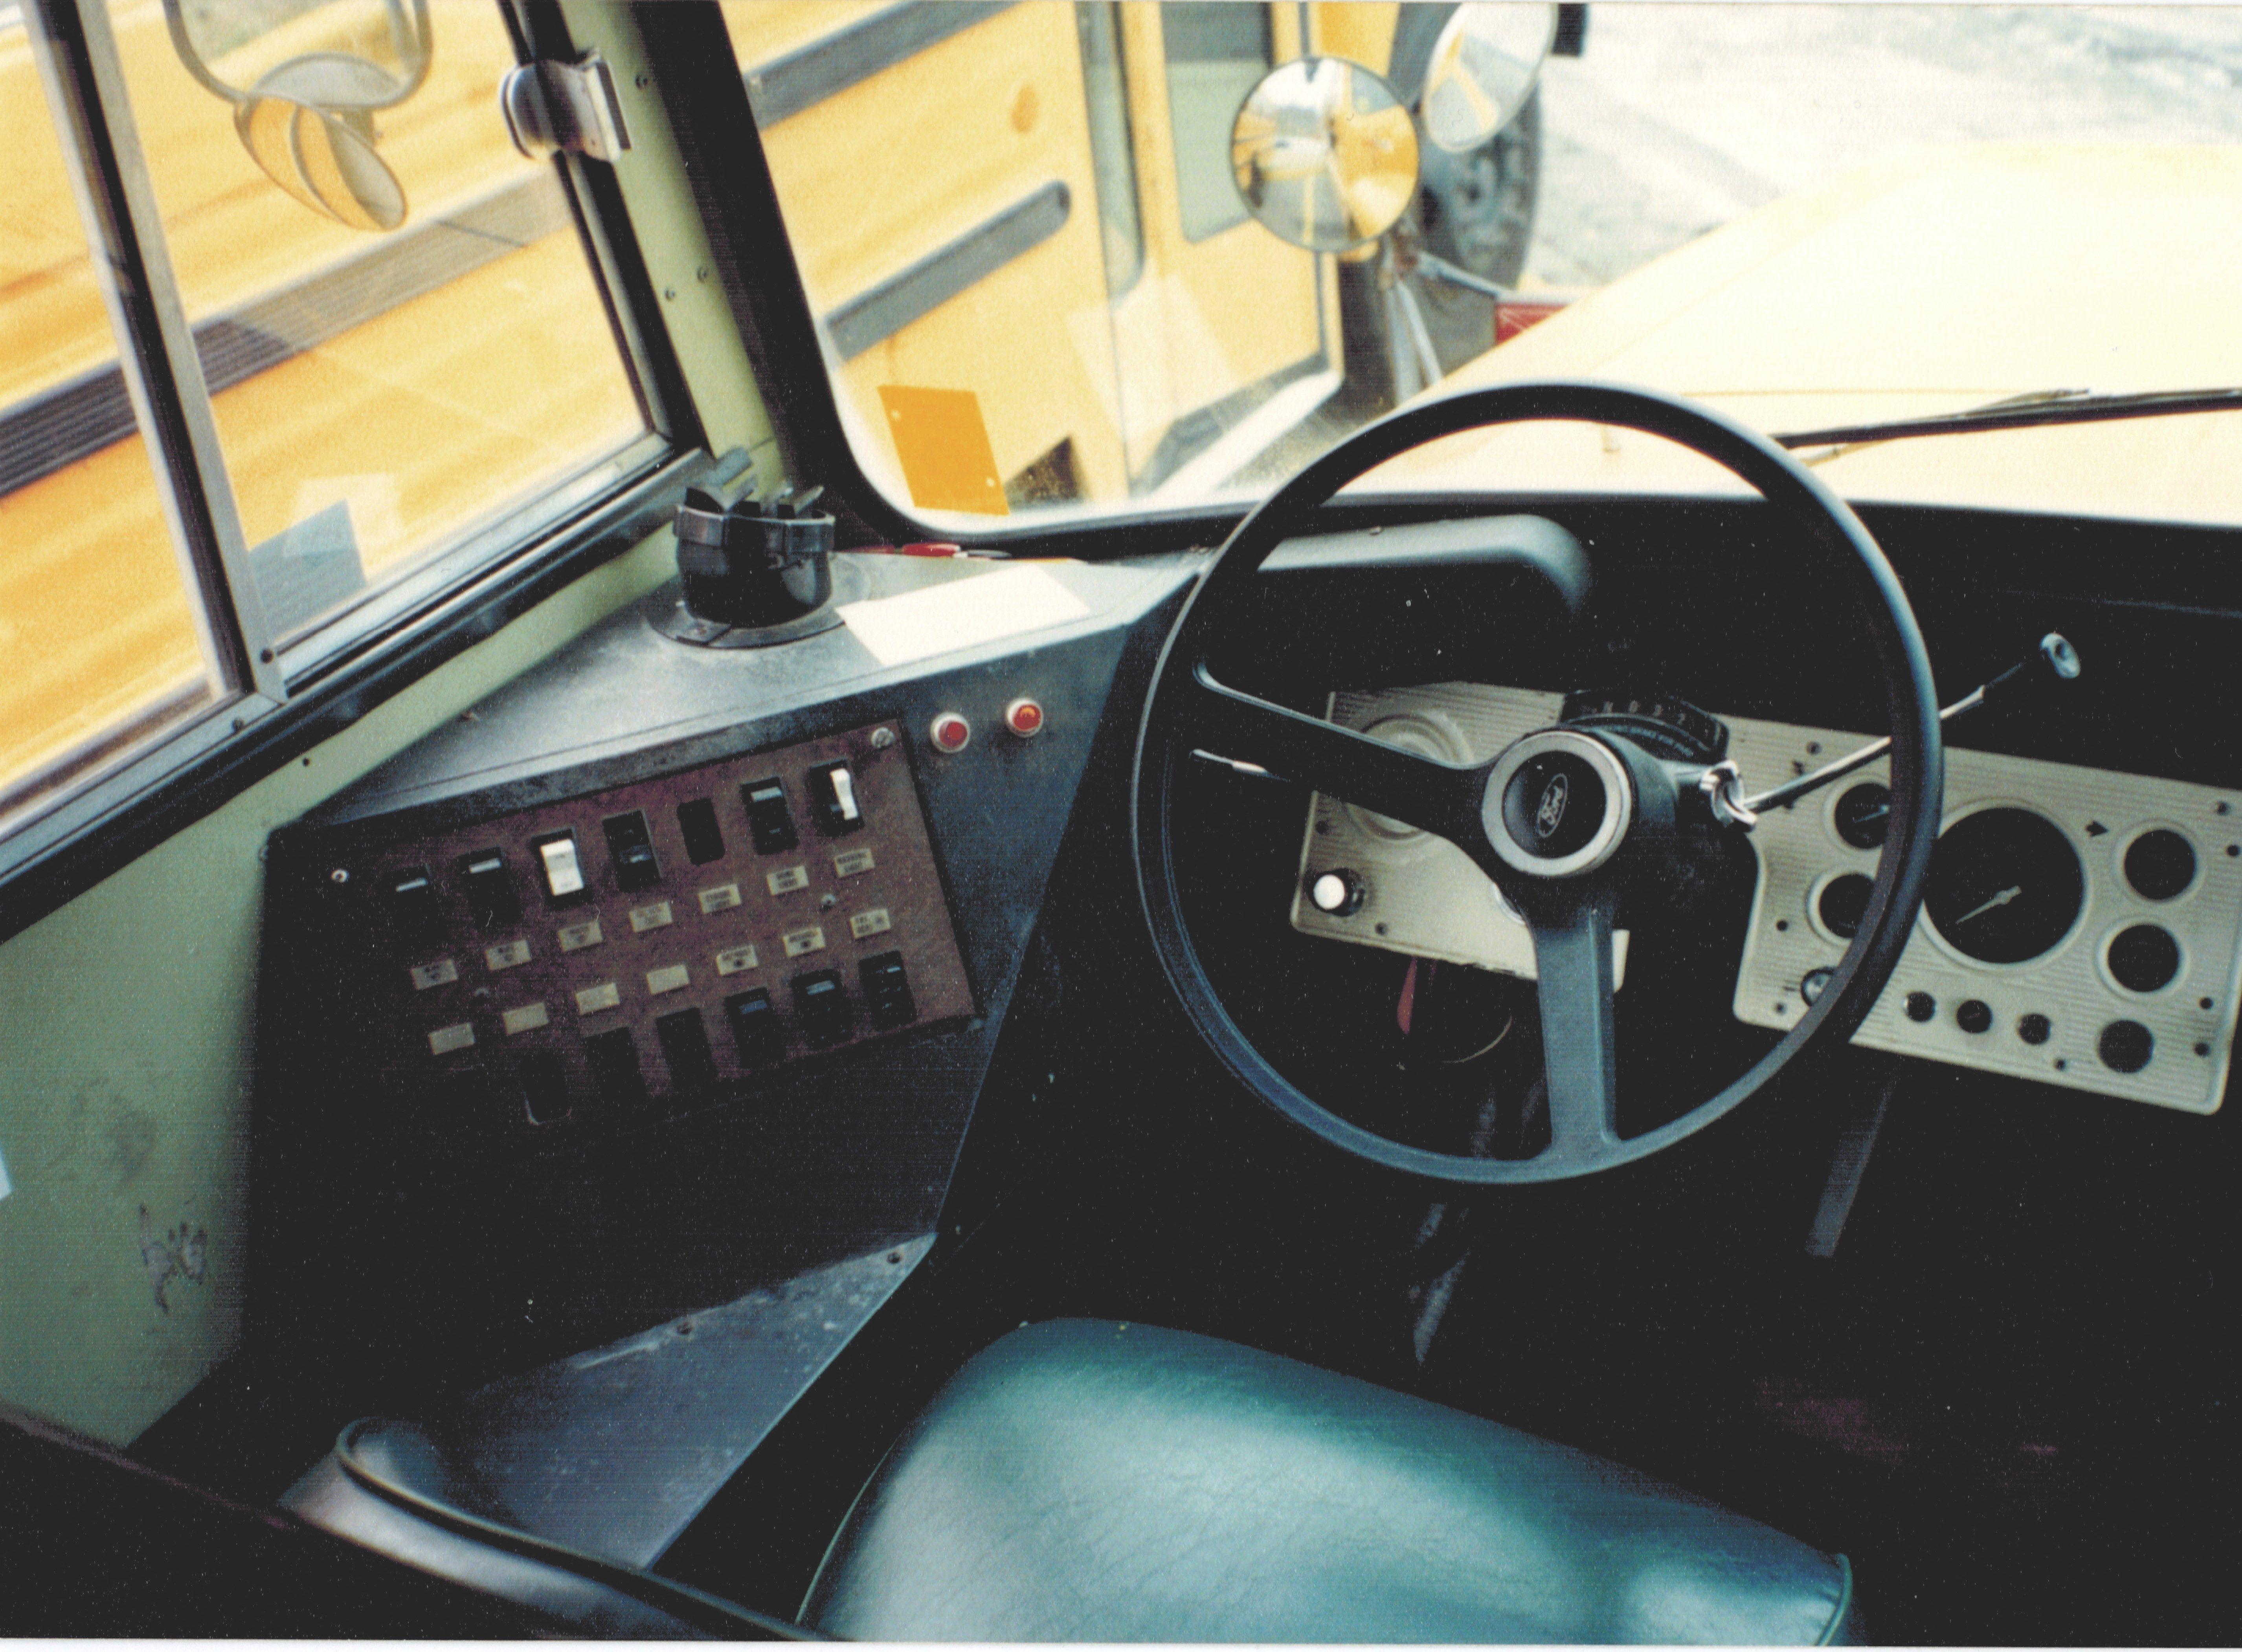 1984 Ford B 700 370 4v 4 Spd Auto Ward Amtran Volunteer 65 Pass Hoover City Schools Bus 84 1 Formerly Jefferson School Bus Bus Interior Bus Driver